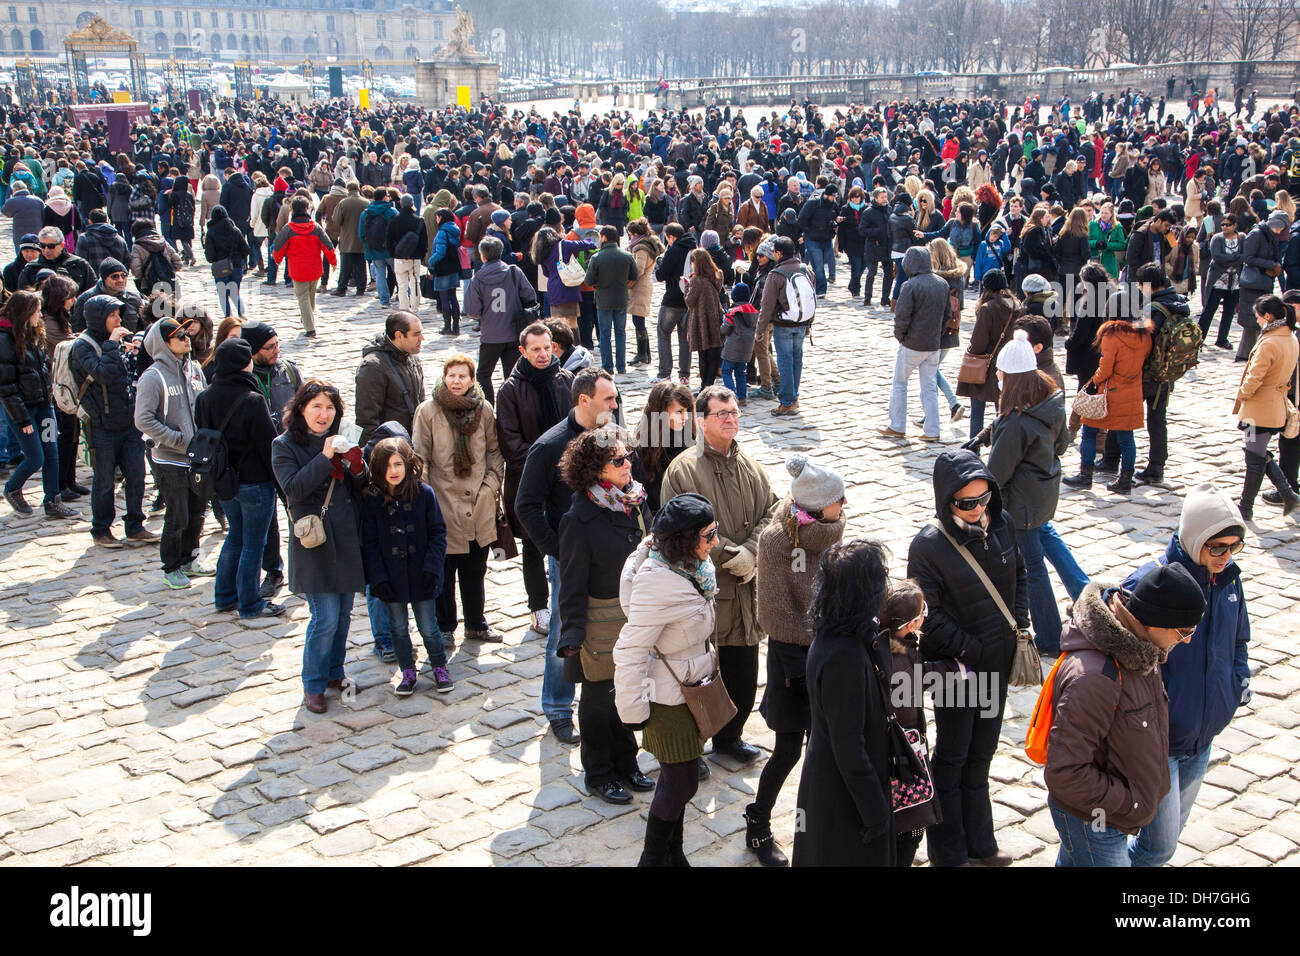 Queue of tourists, Palace of Versailles, Paris, France - Stock Image